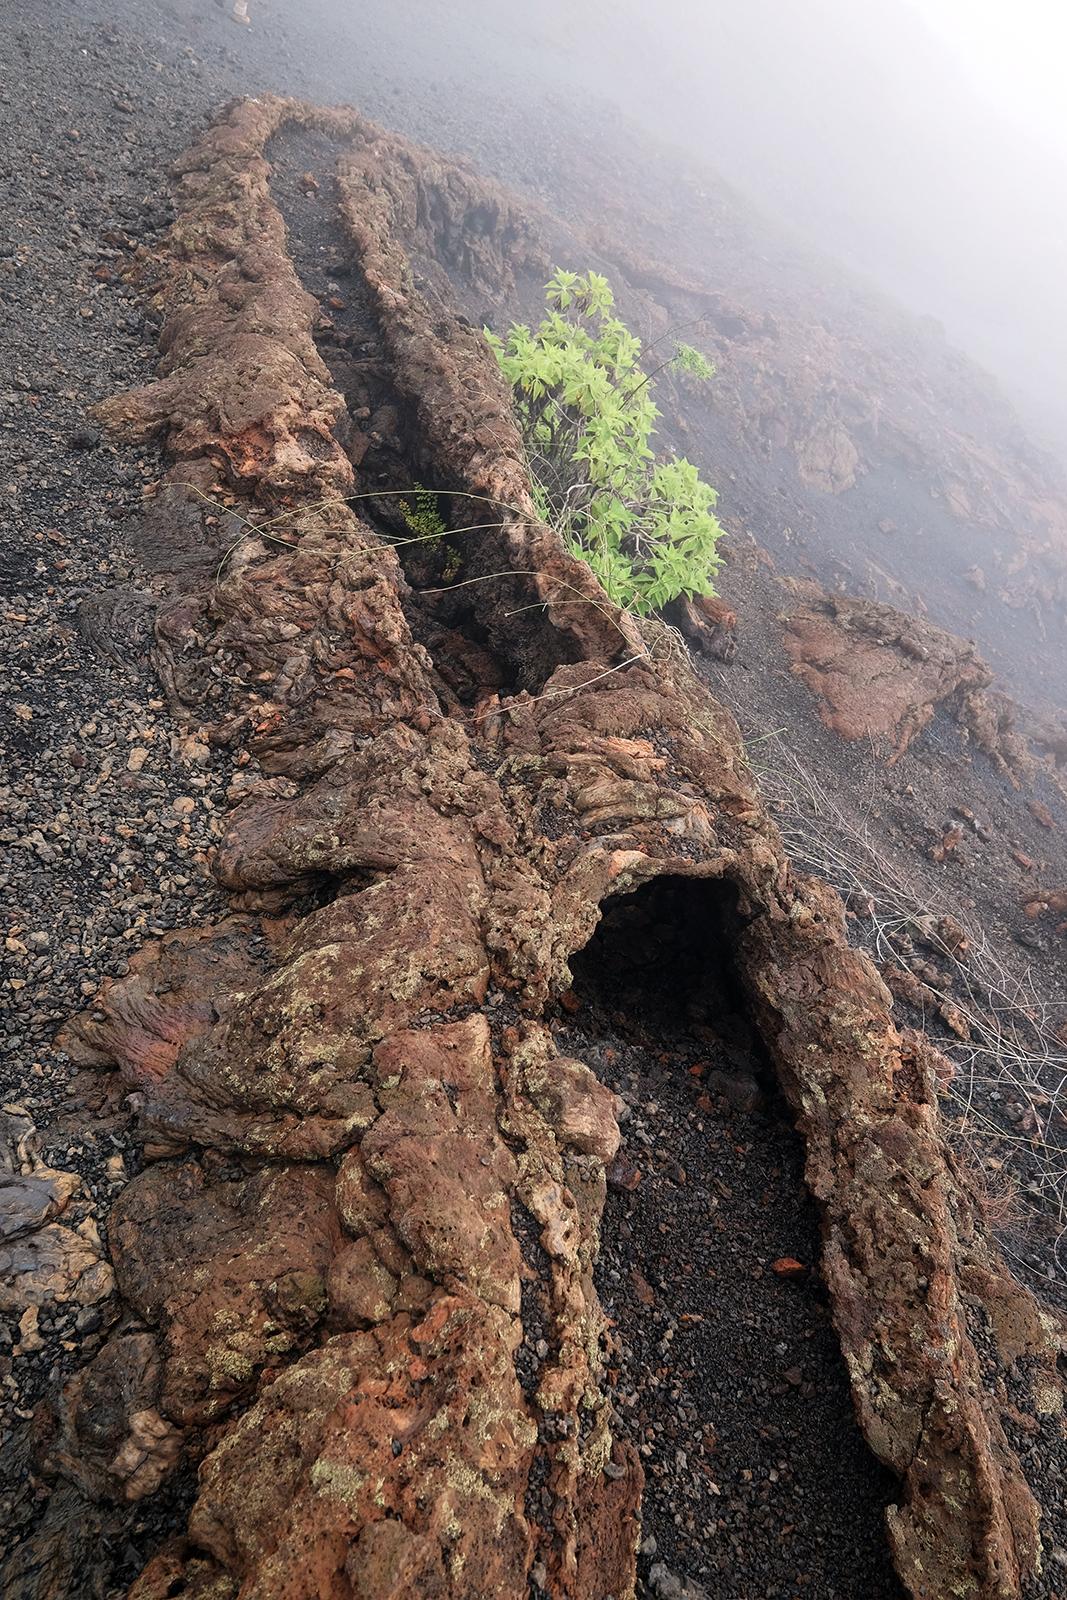 01_Volcan_Sierra_Negra_09_volcan_Chico_mini_tuneles.JPG